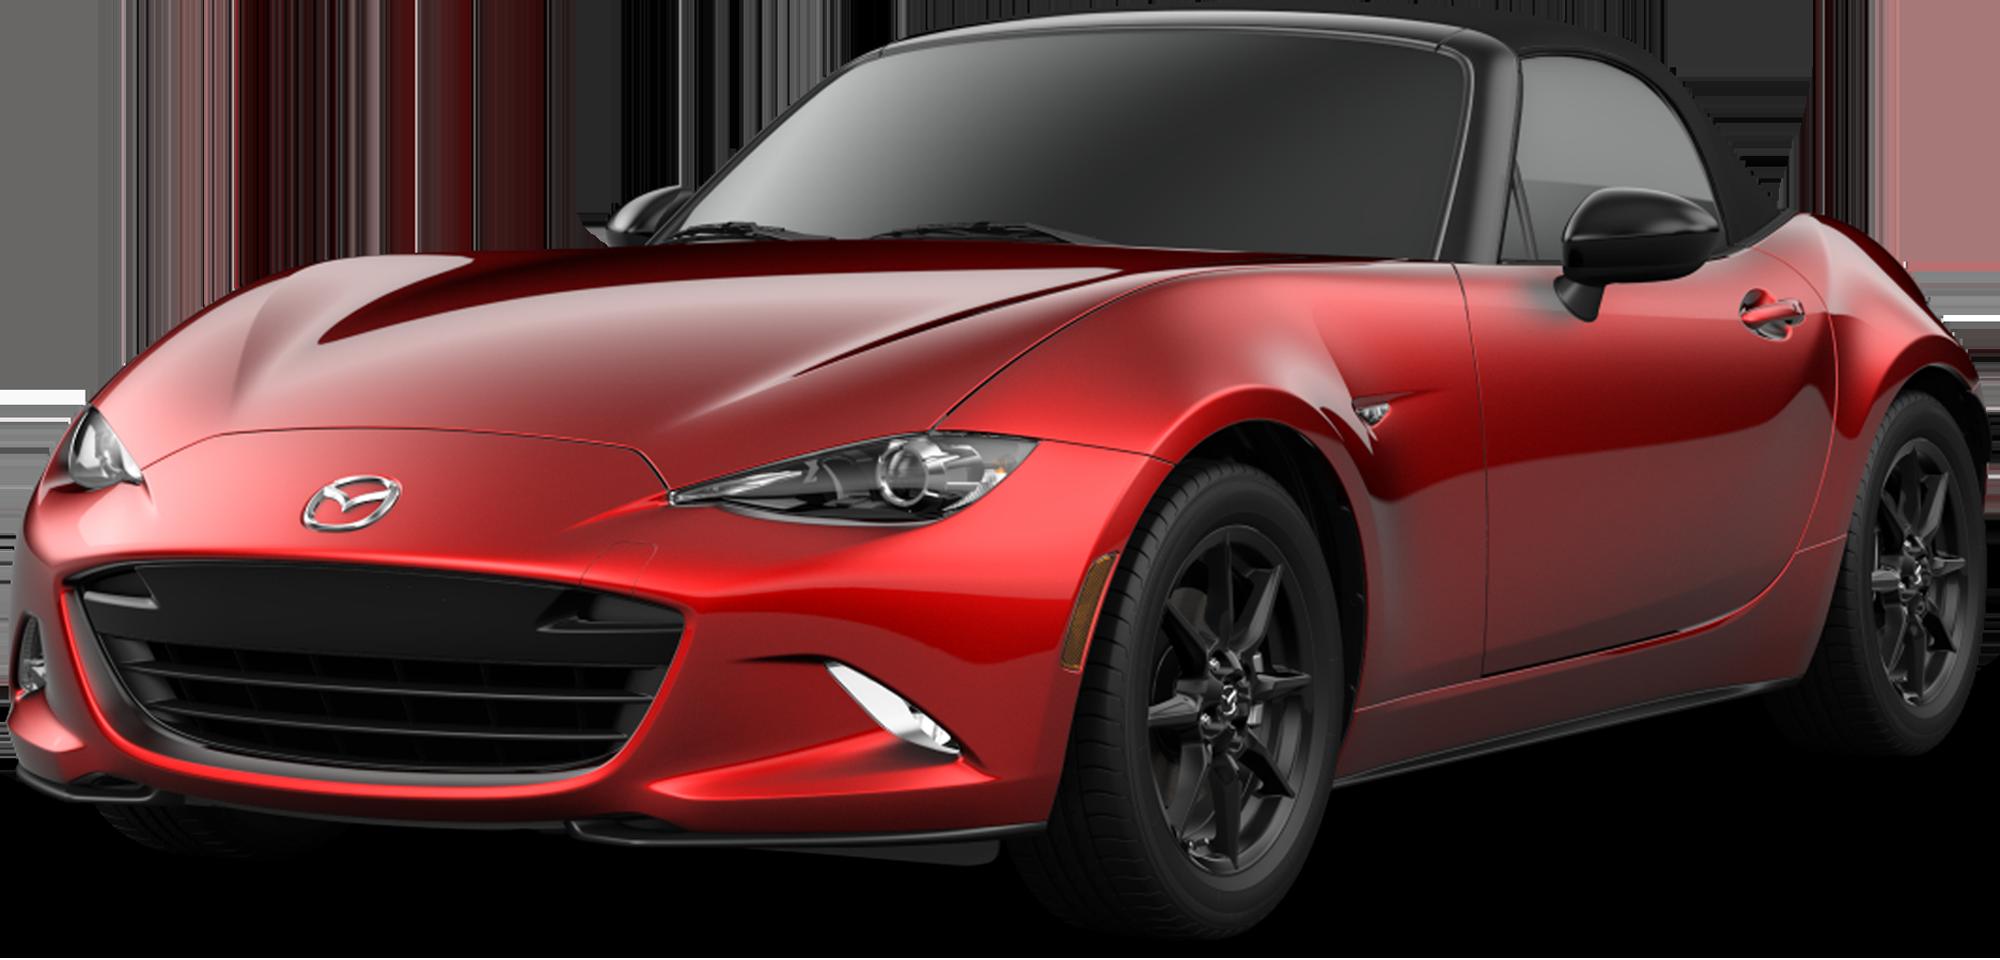 Mazda Miata 2020 / 2020 Mazda MX-5 Miata Price, Specs ...